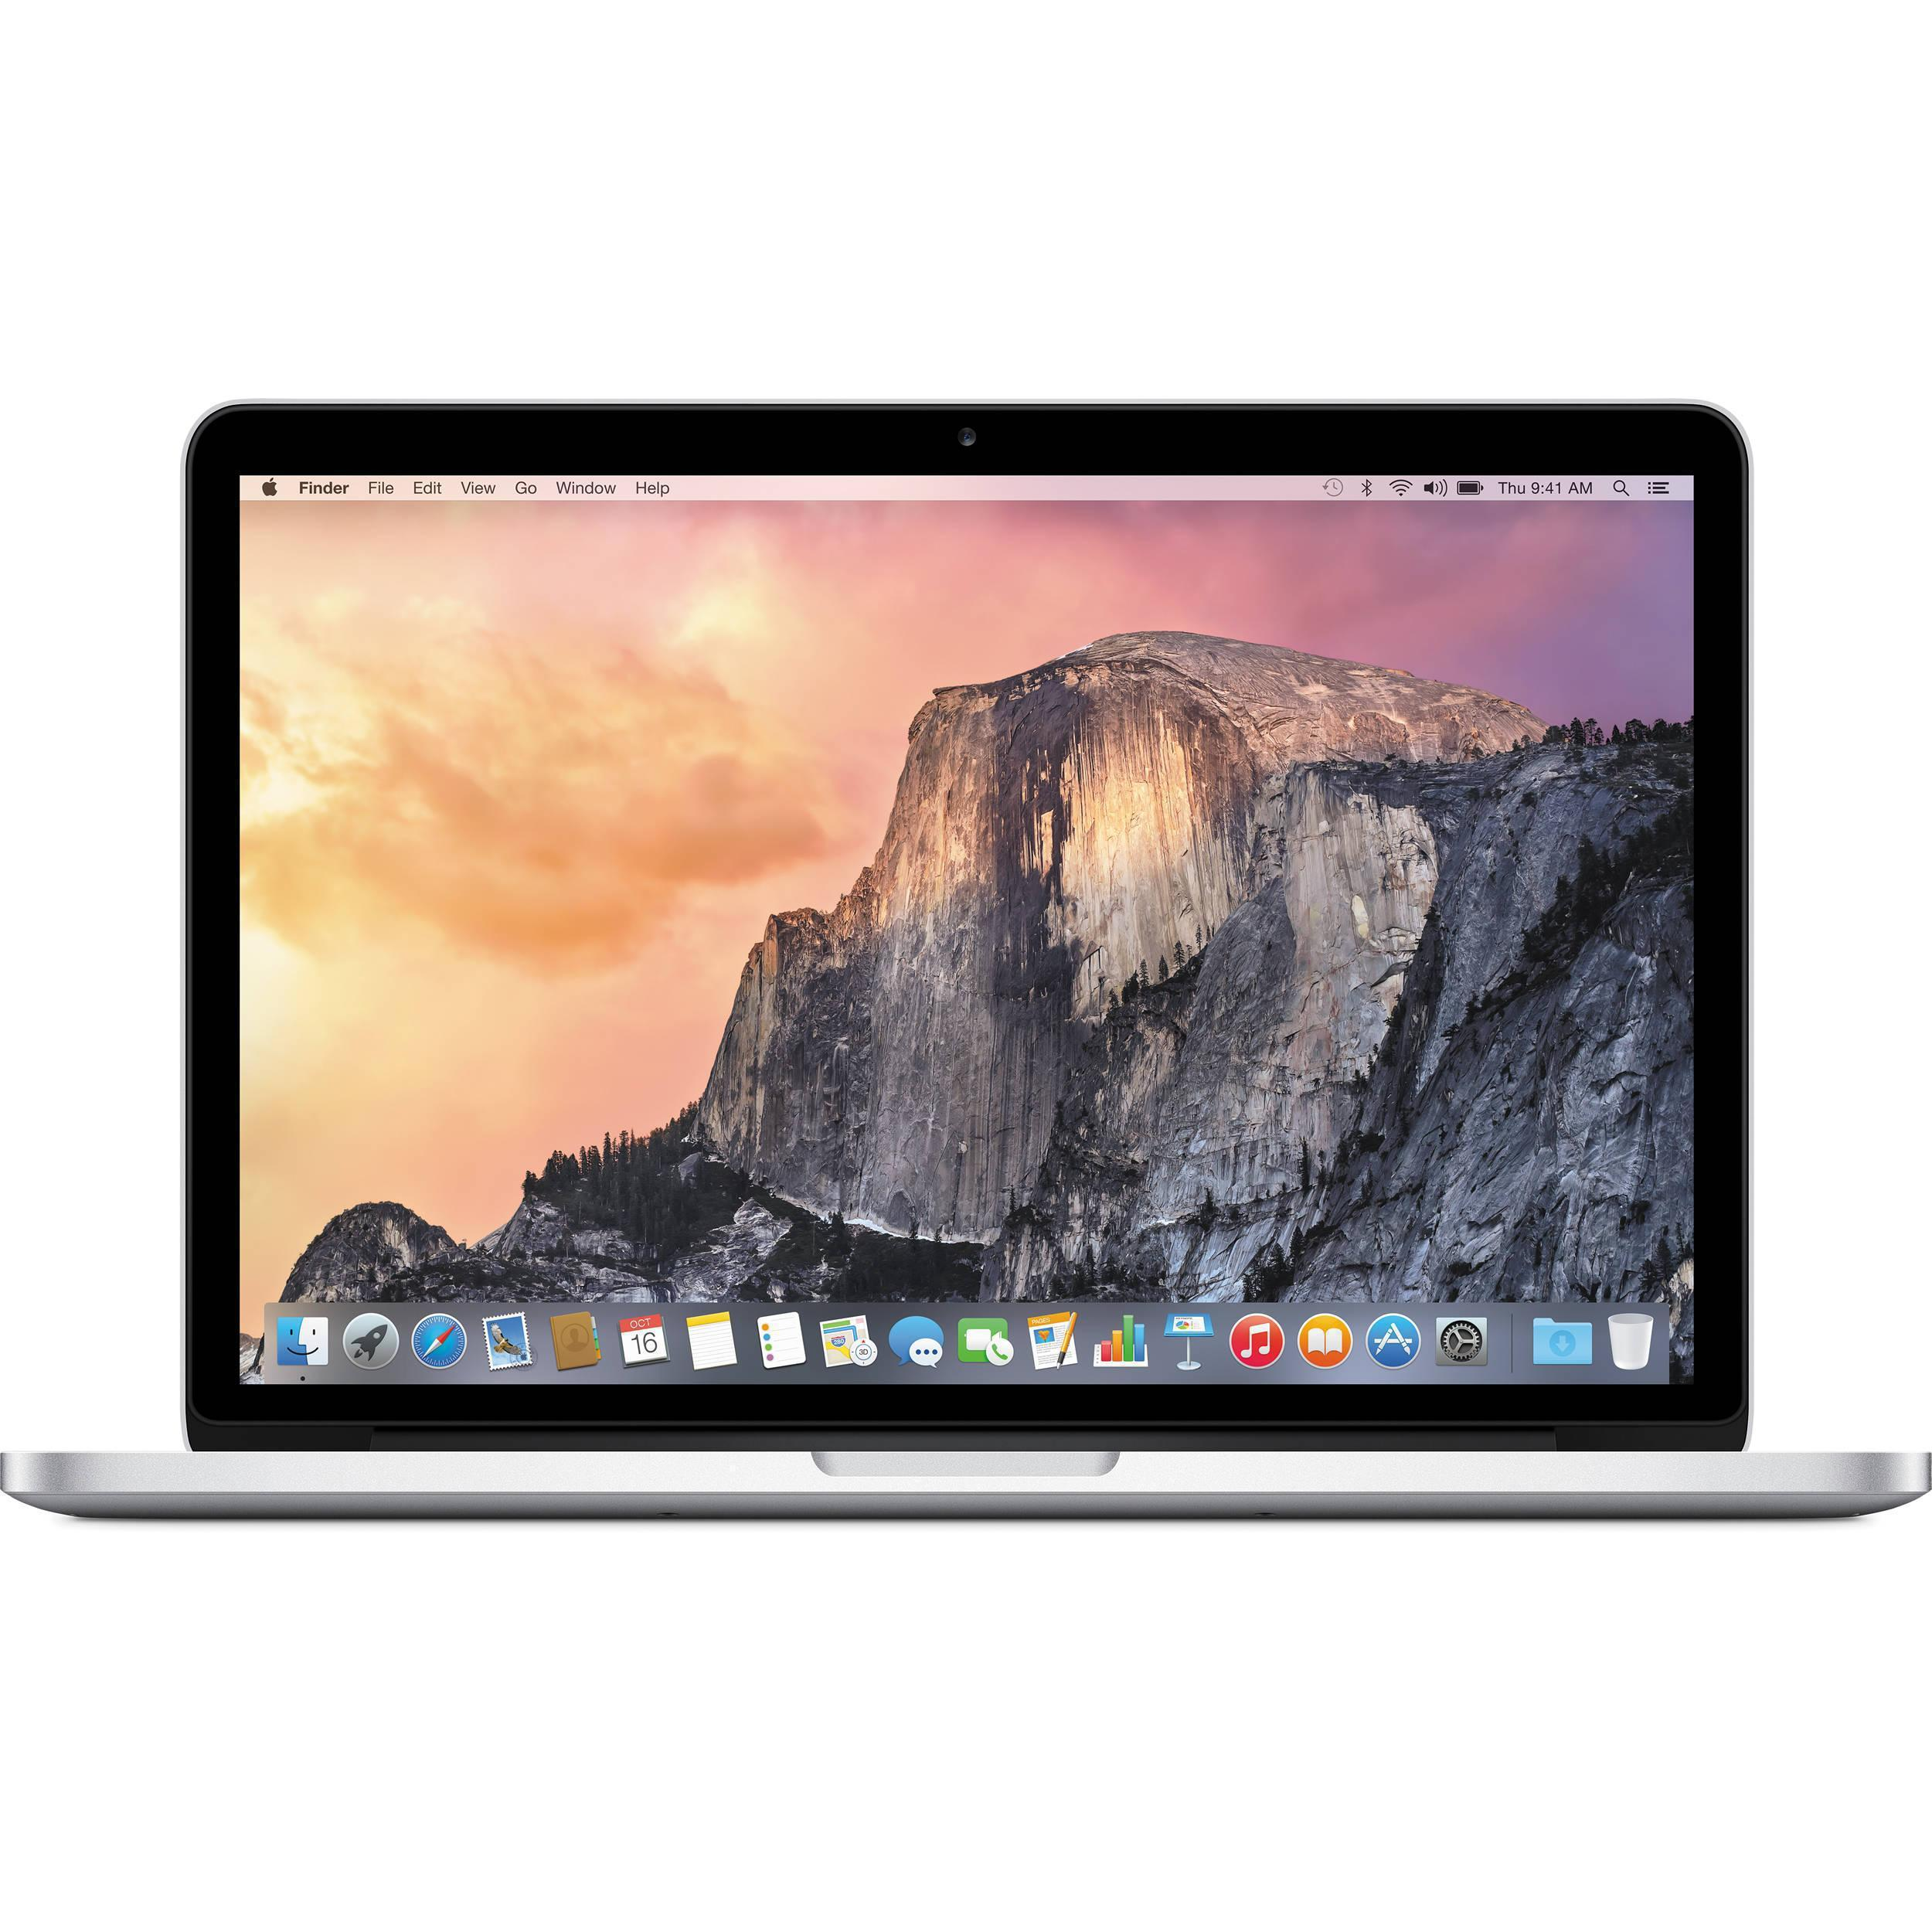 "MacBook Pro 13"" Retina (2013) - Core i5 2,4 GHz - SSD 128 GB - 4GB - QWERTY - Englisch (US)"